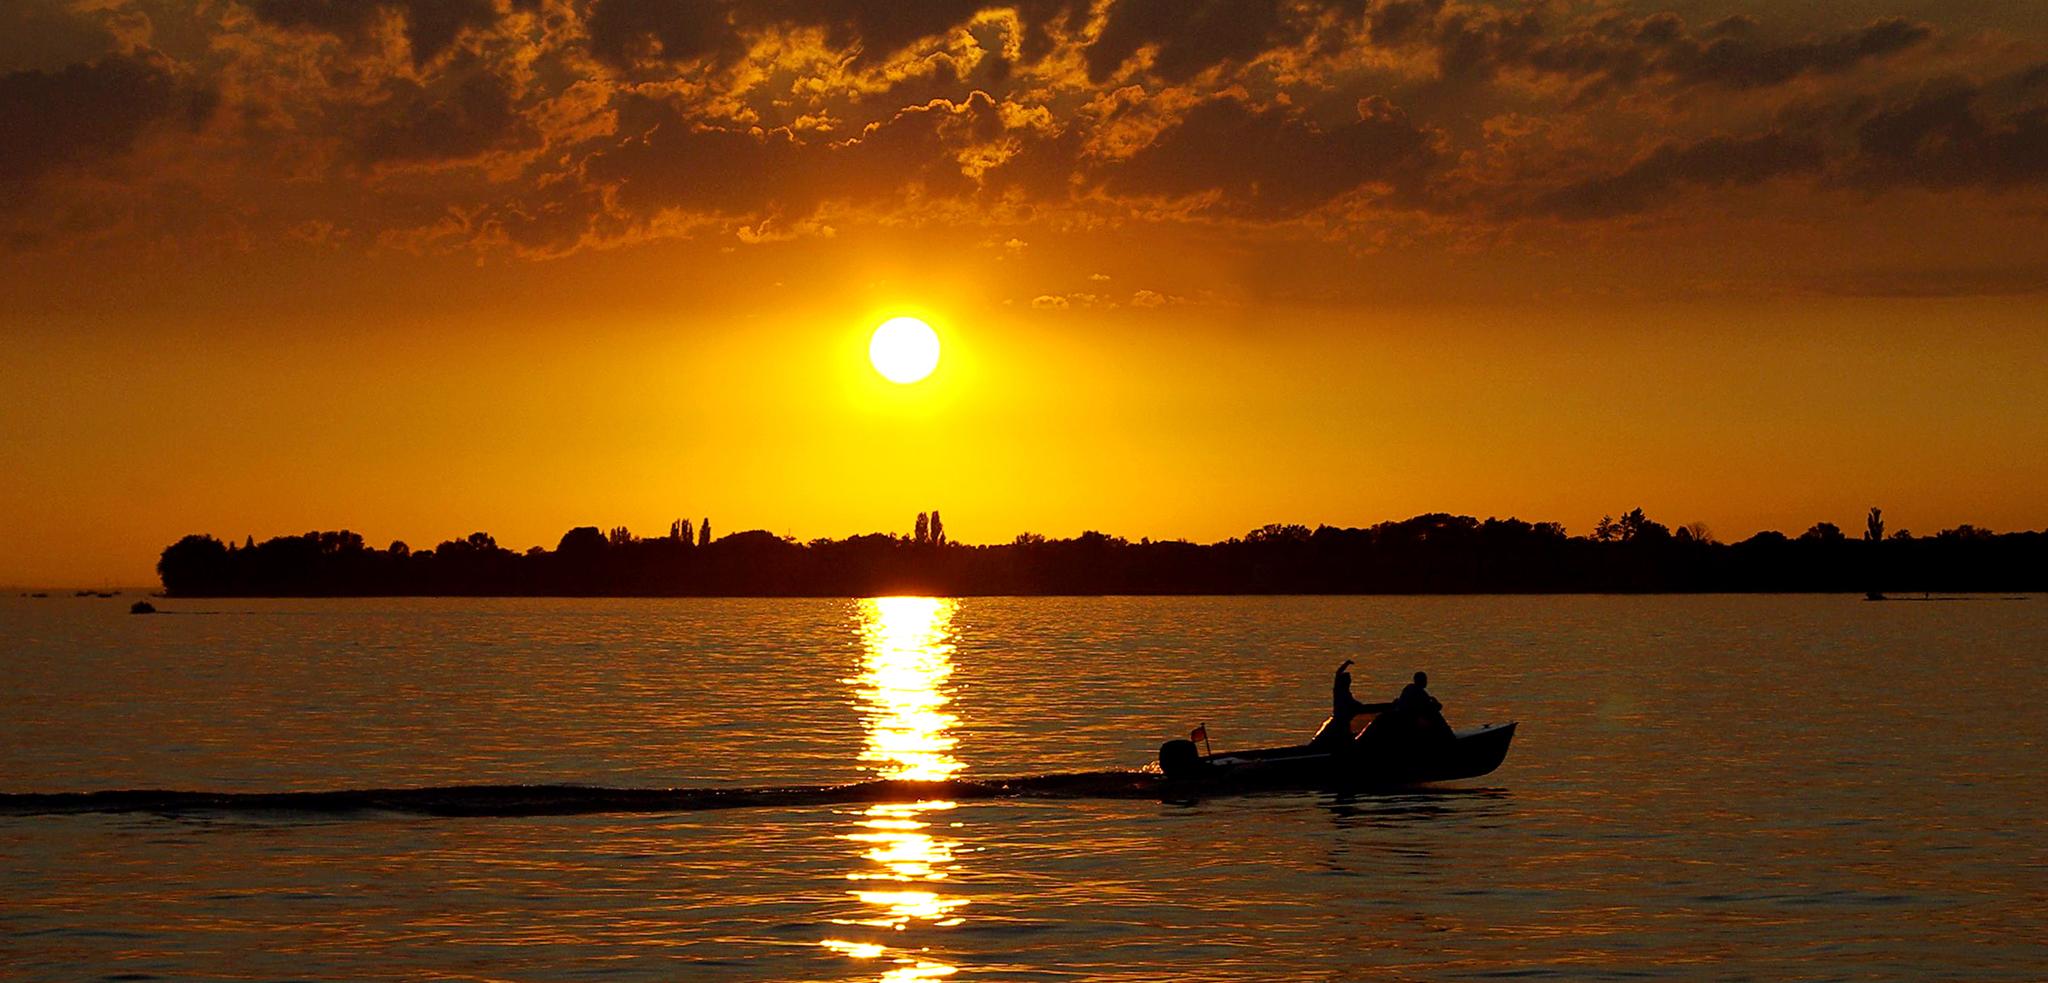 Sonnenuntergang-bodensee